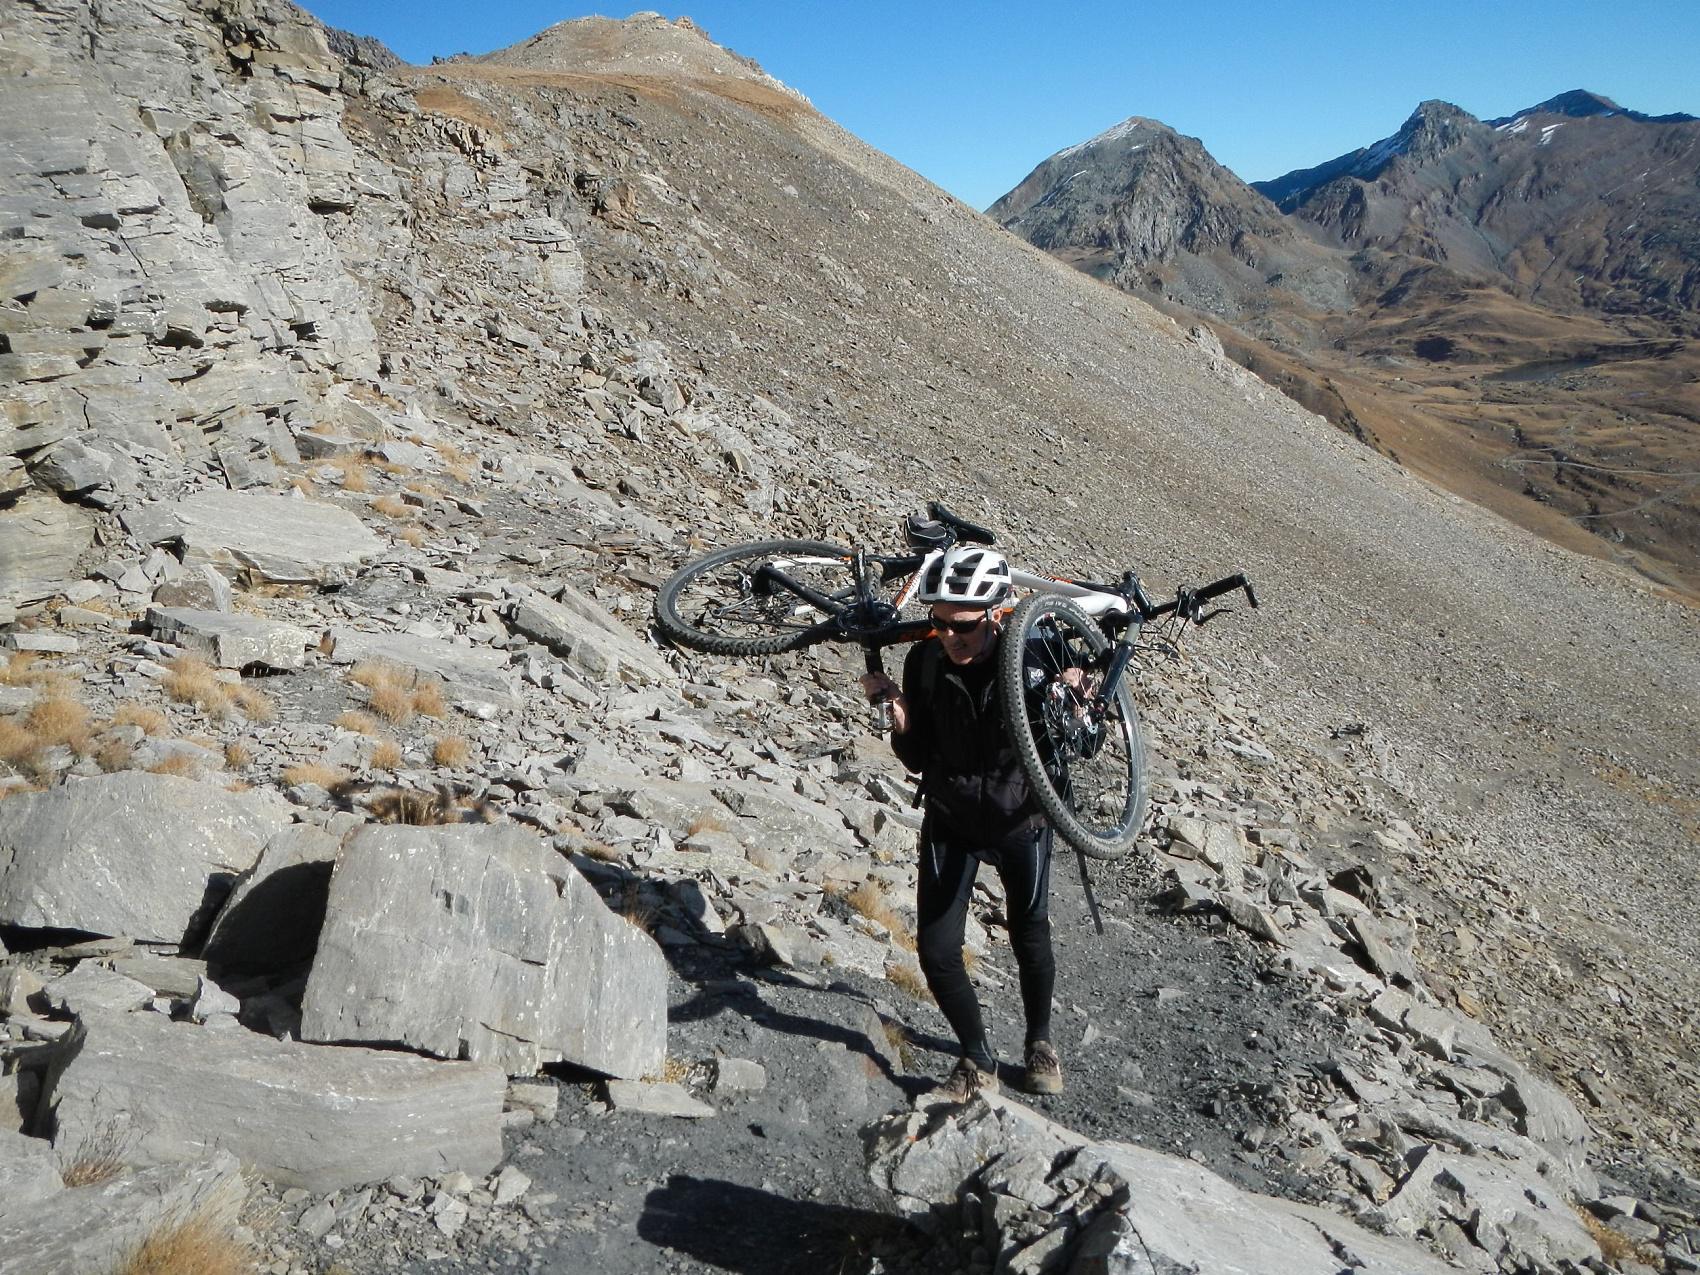 ultimi metri per l'arrivo al passo Invergneux 2902 m.